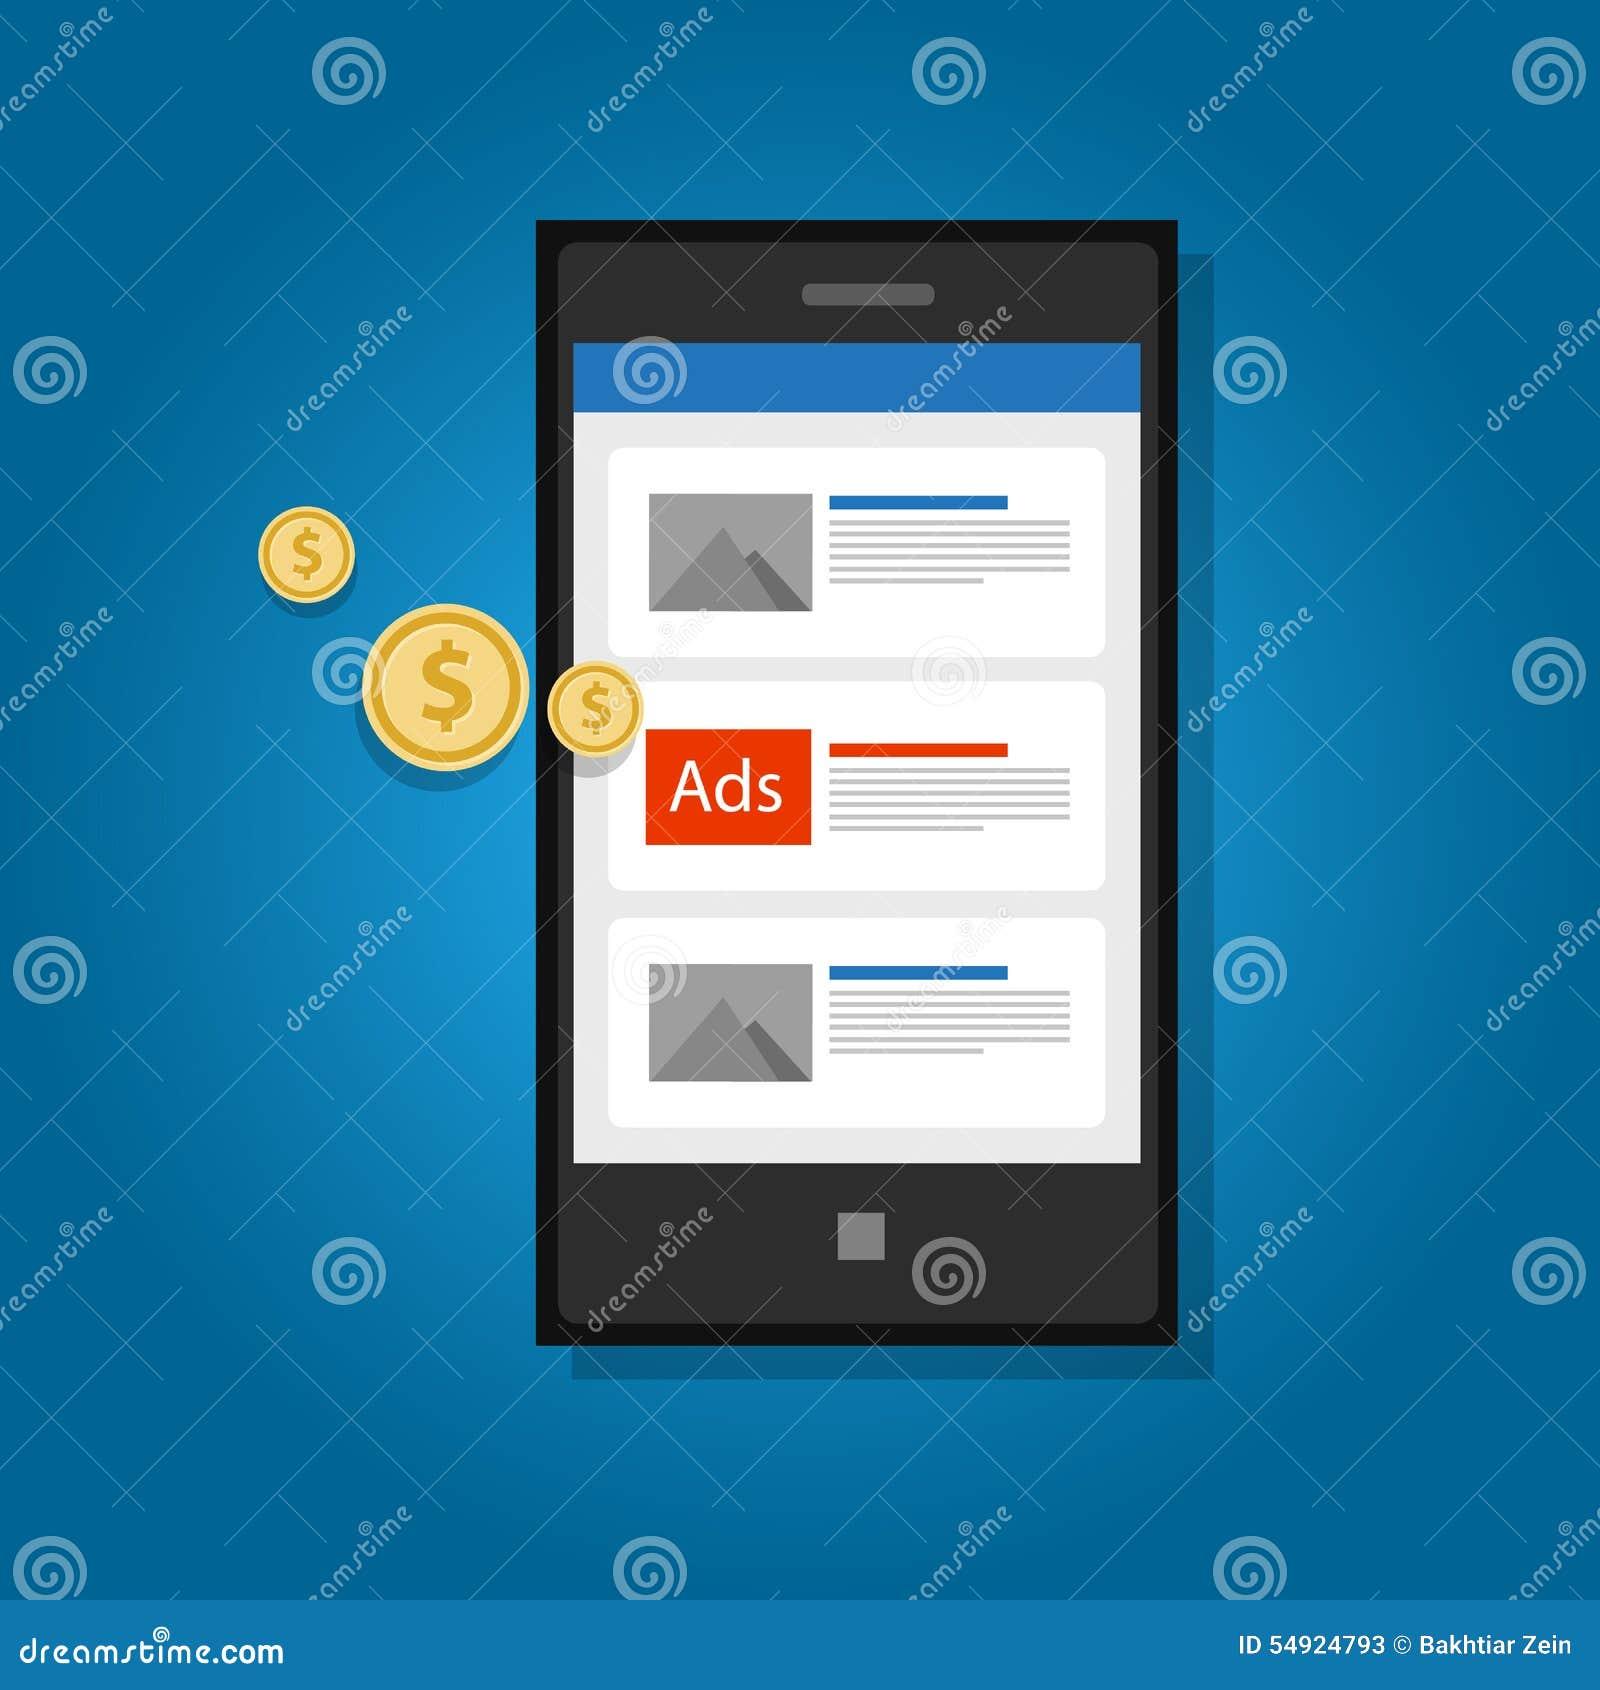 Mobile ads advertising phone click digital